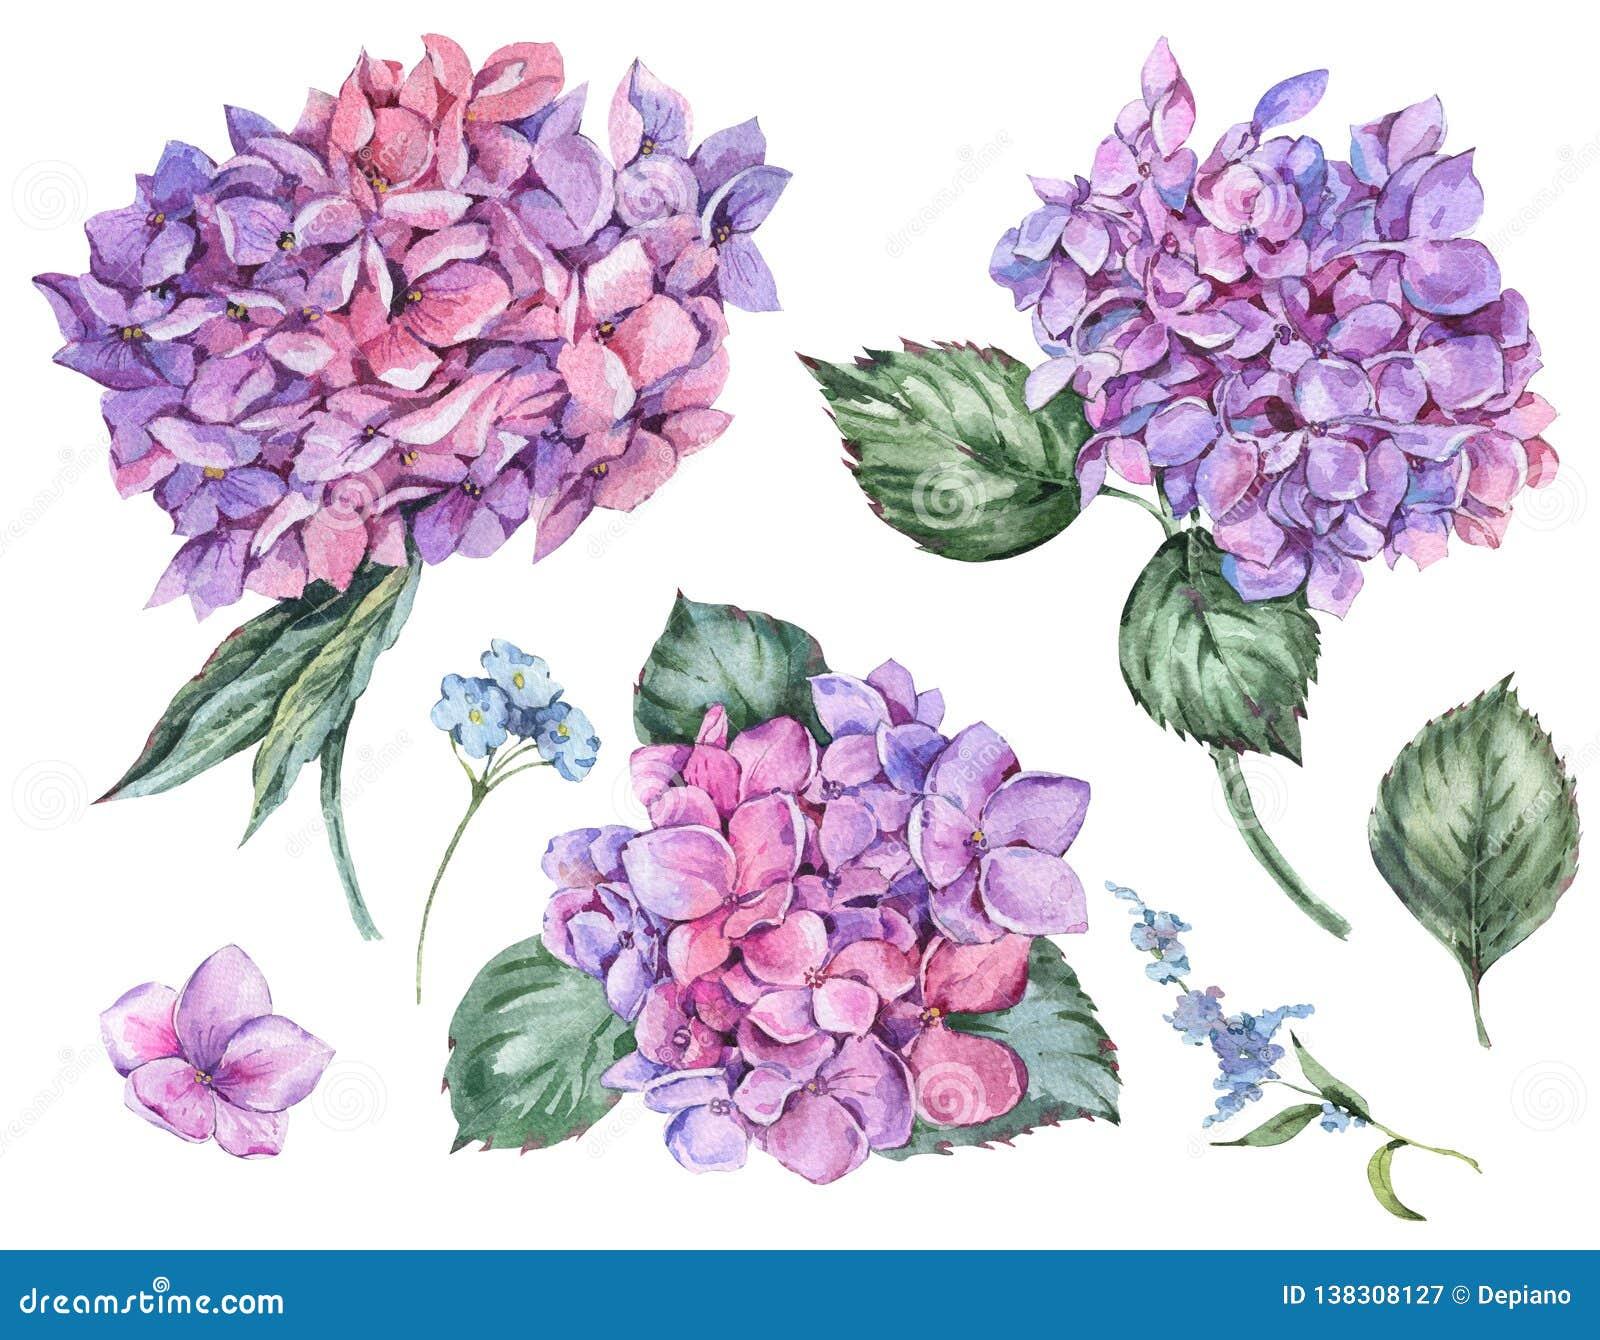 Watercolor Summer Floral Set of Vintage Blooming Hydrangea